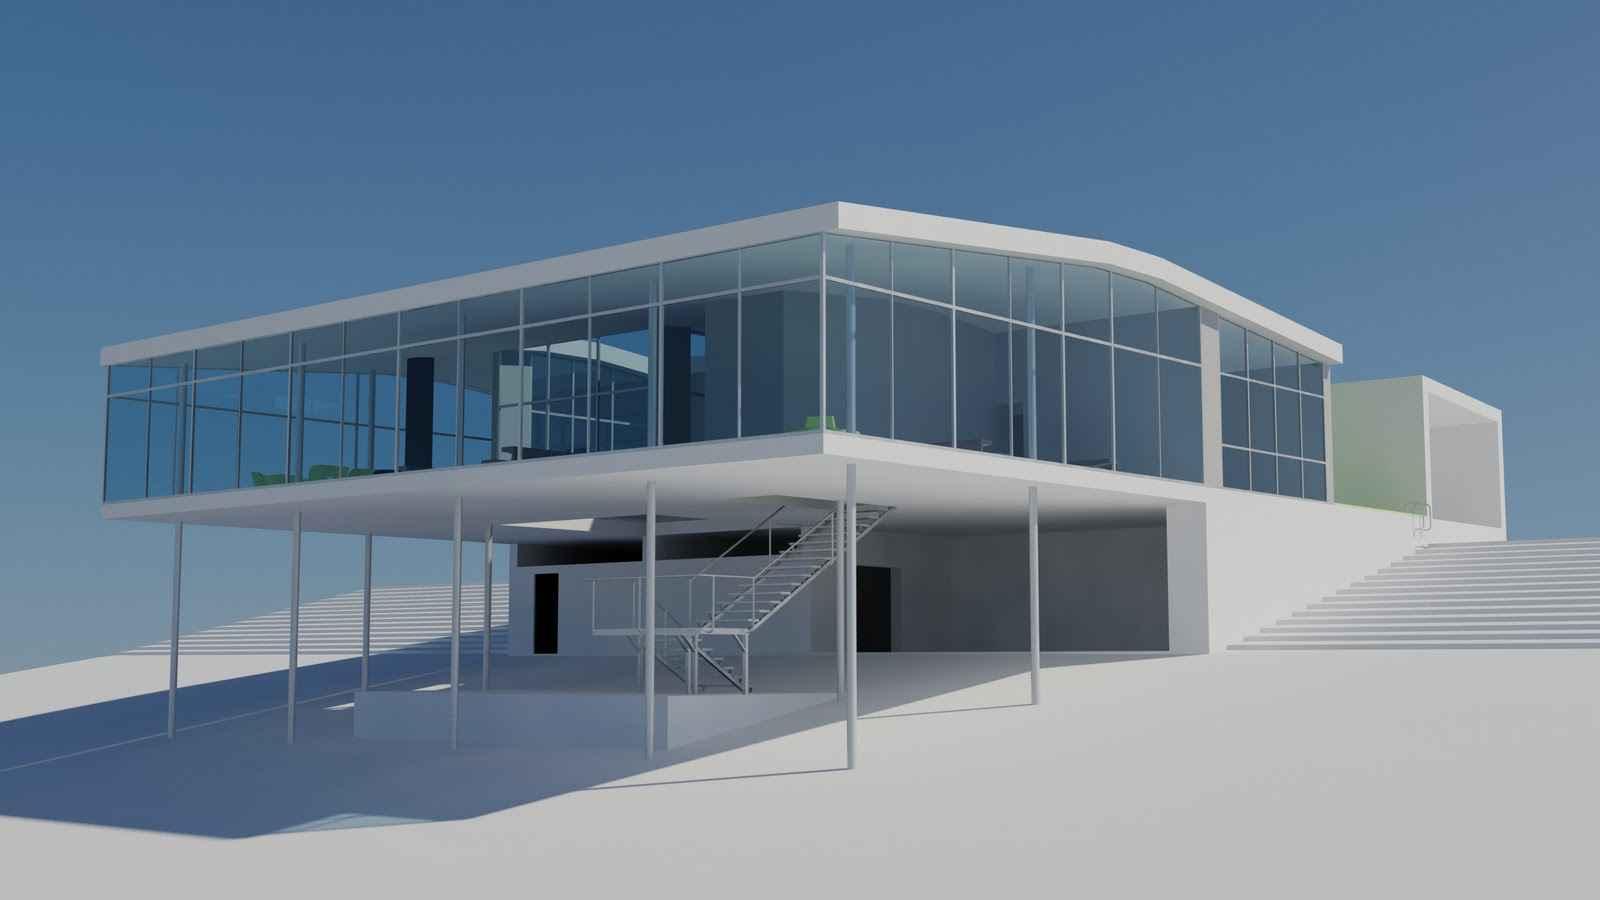 Casa de Vidrio – Lina Bo Bardi – Architectural Autocad Drawings ...